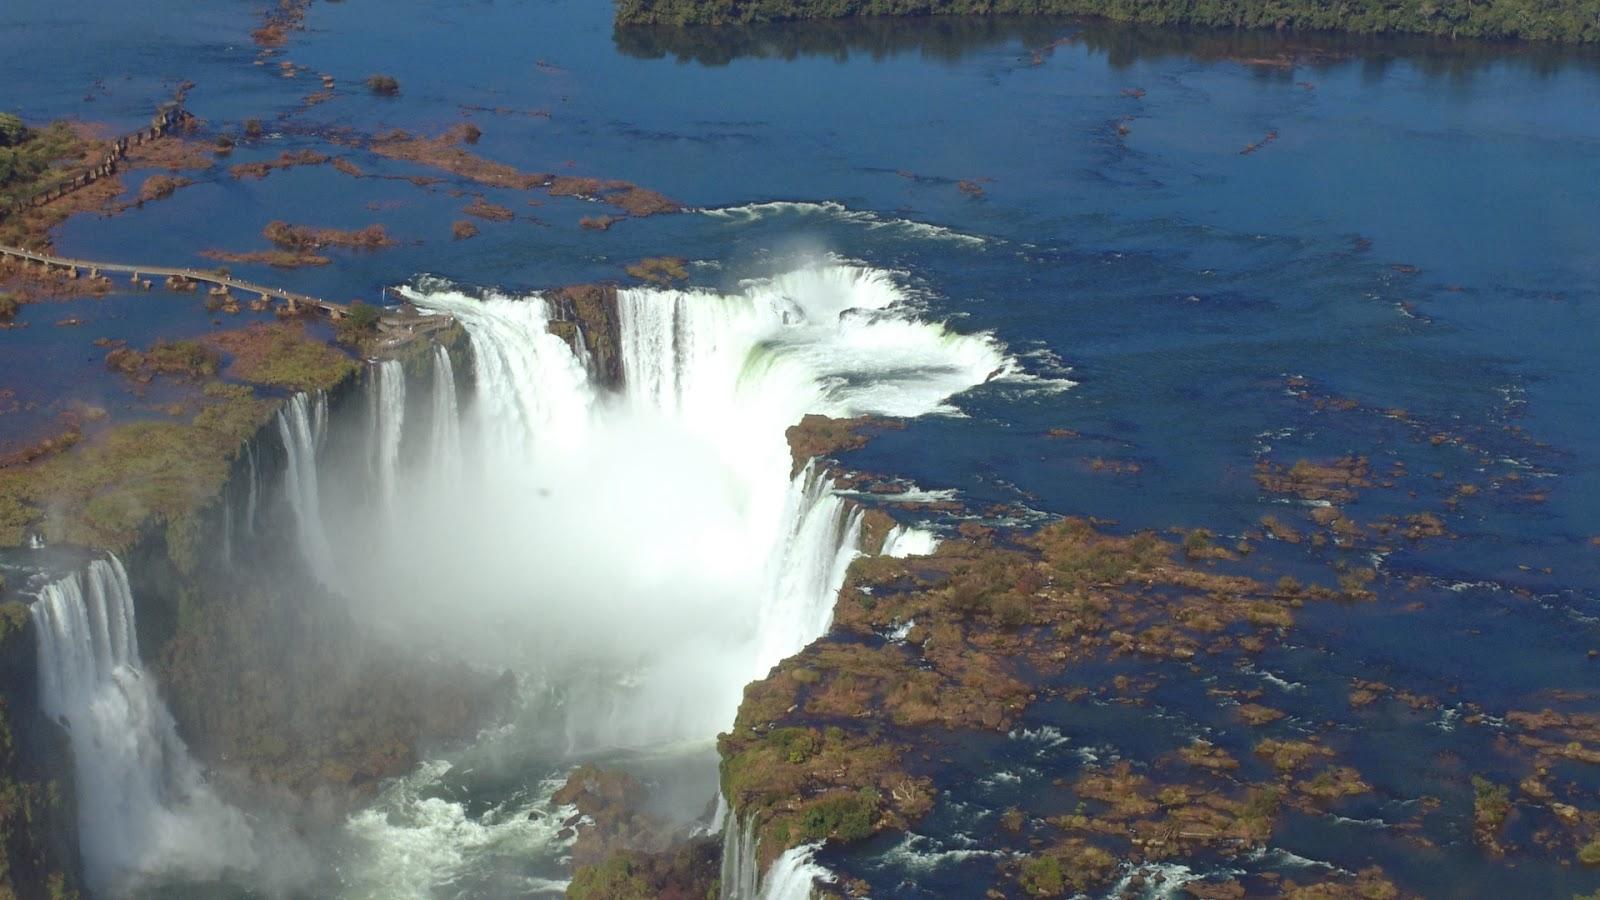 Jog Falls Hd Wallpaper Watervallen Wallpapers Hd Wallpapers